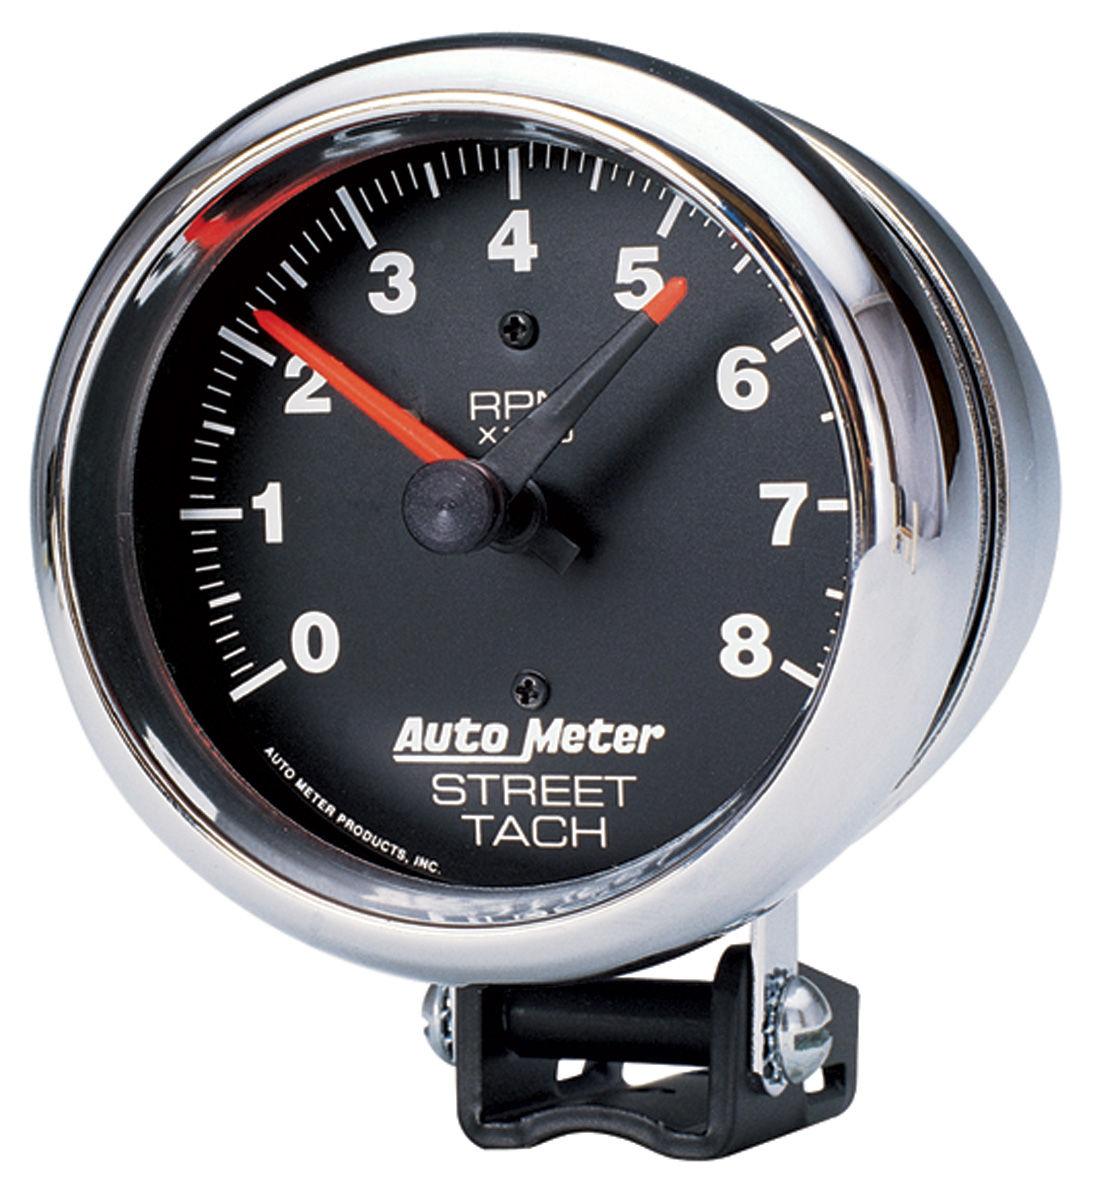 Wiring Diagram Auto Meter Tach Wiring Diagram Auto Meter Tach Wiring